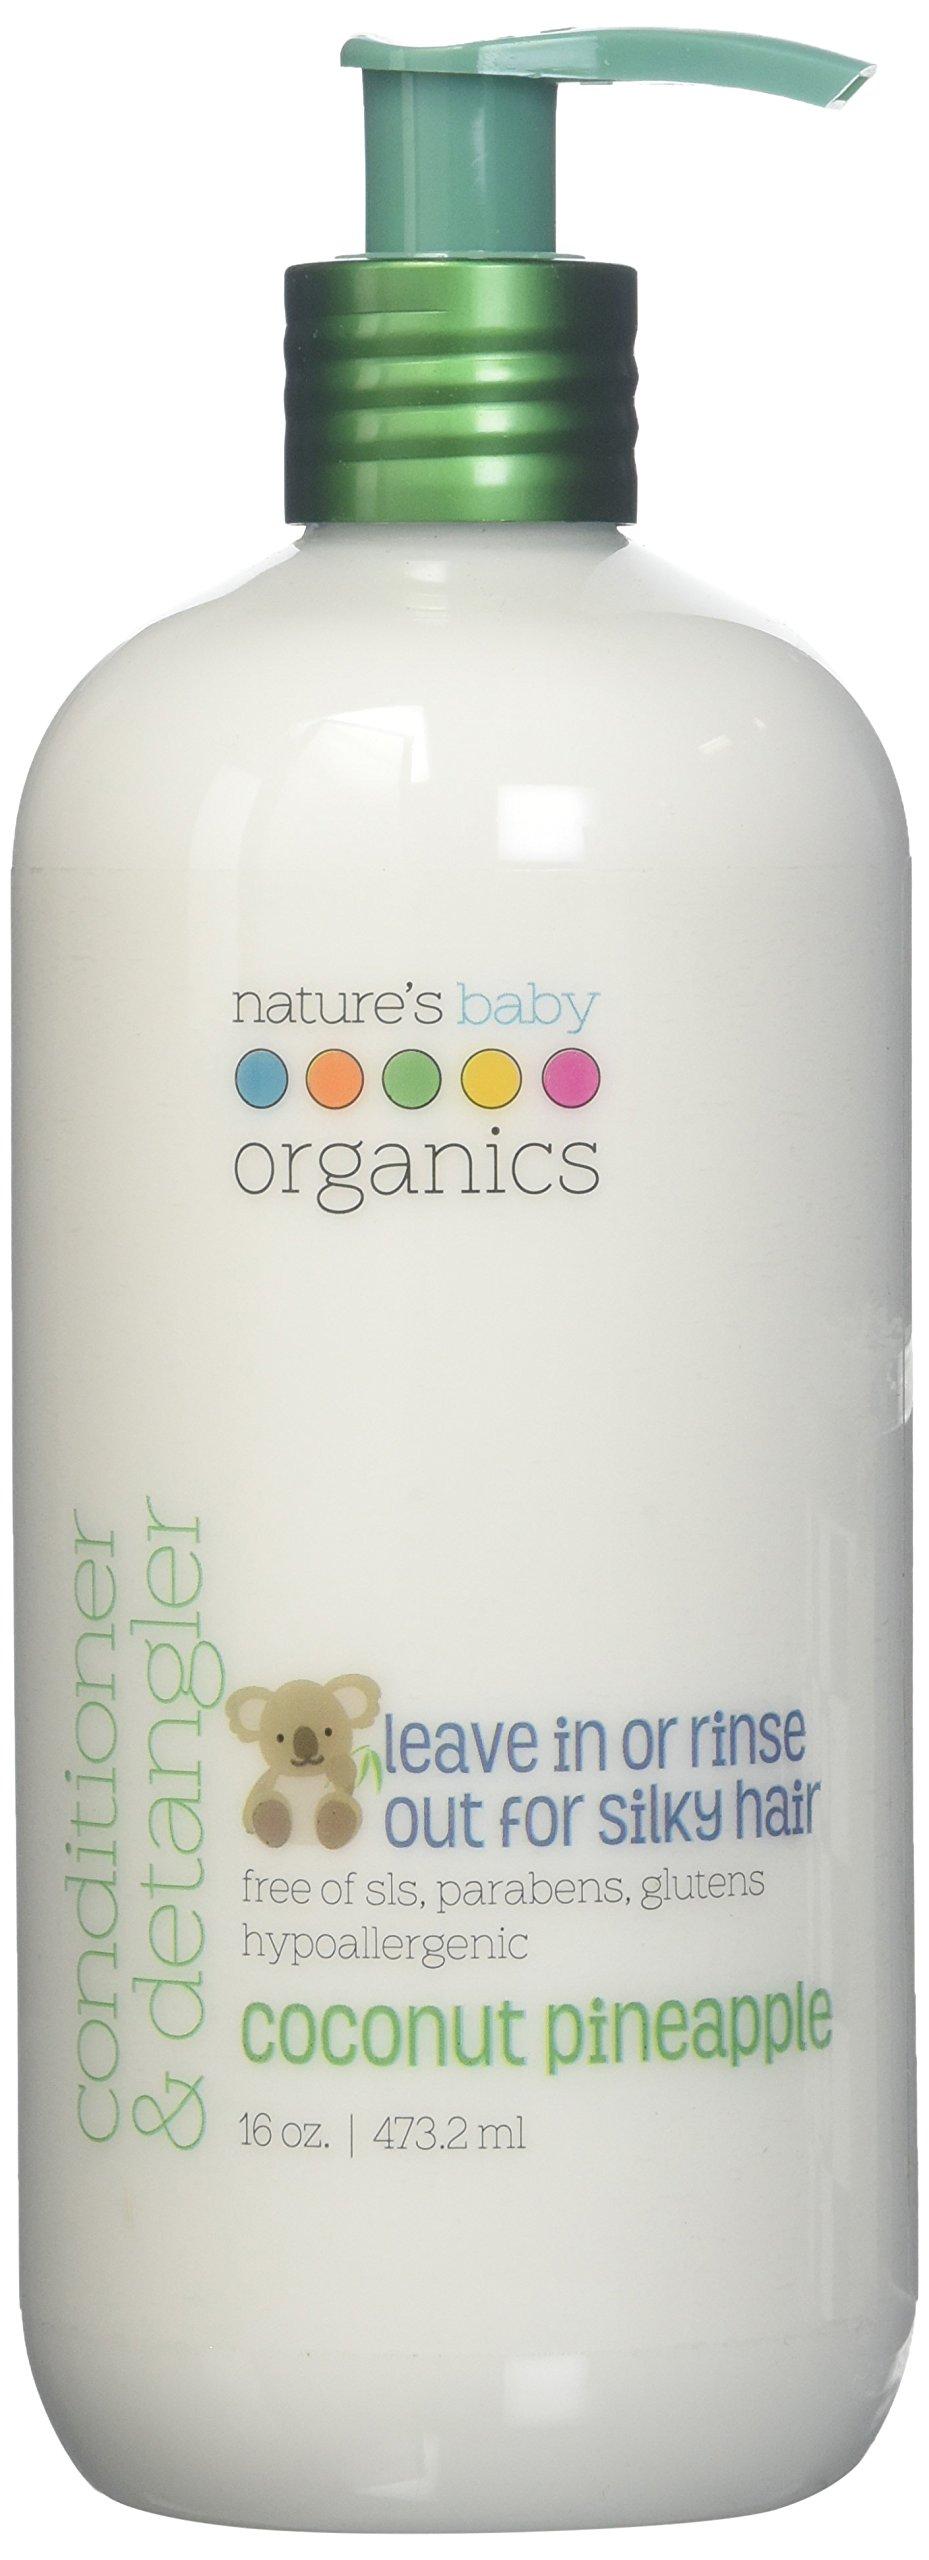 Nature's Baby Organics Conditioner & Detangler, Coconut Pineapple, 16 oz (2-Pack) | Babies, Kids, Adults! Moisturizing, Gentle, Rich, Hypoallergenic | No Parabens, SLS, Glutens